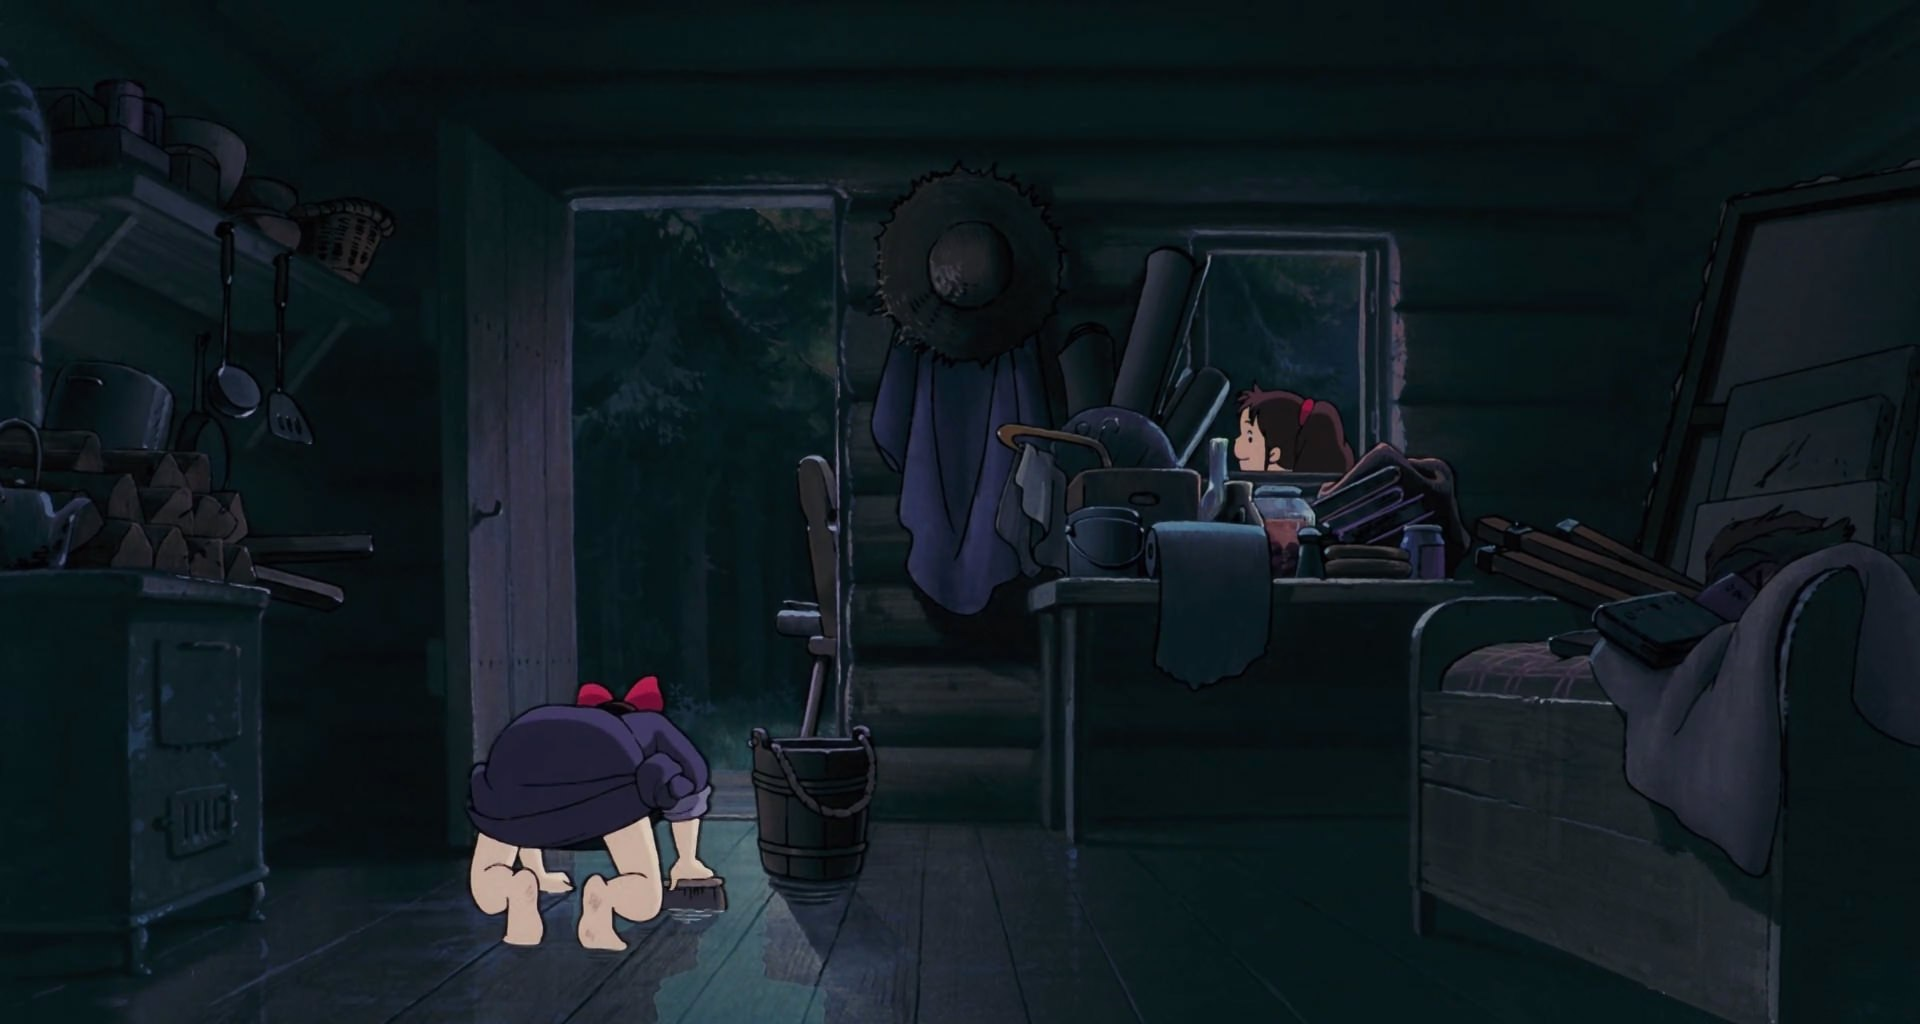 Ursula's Log Cabin